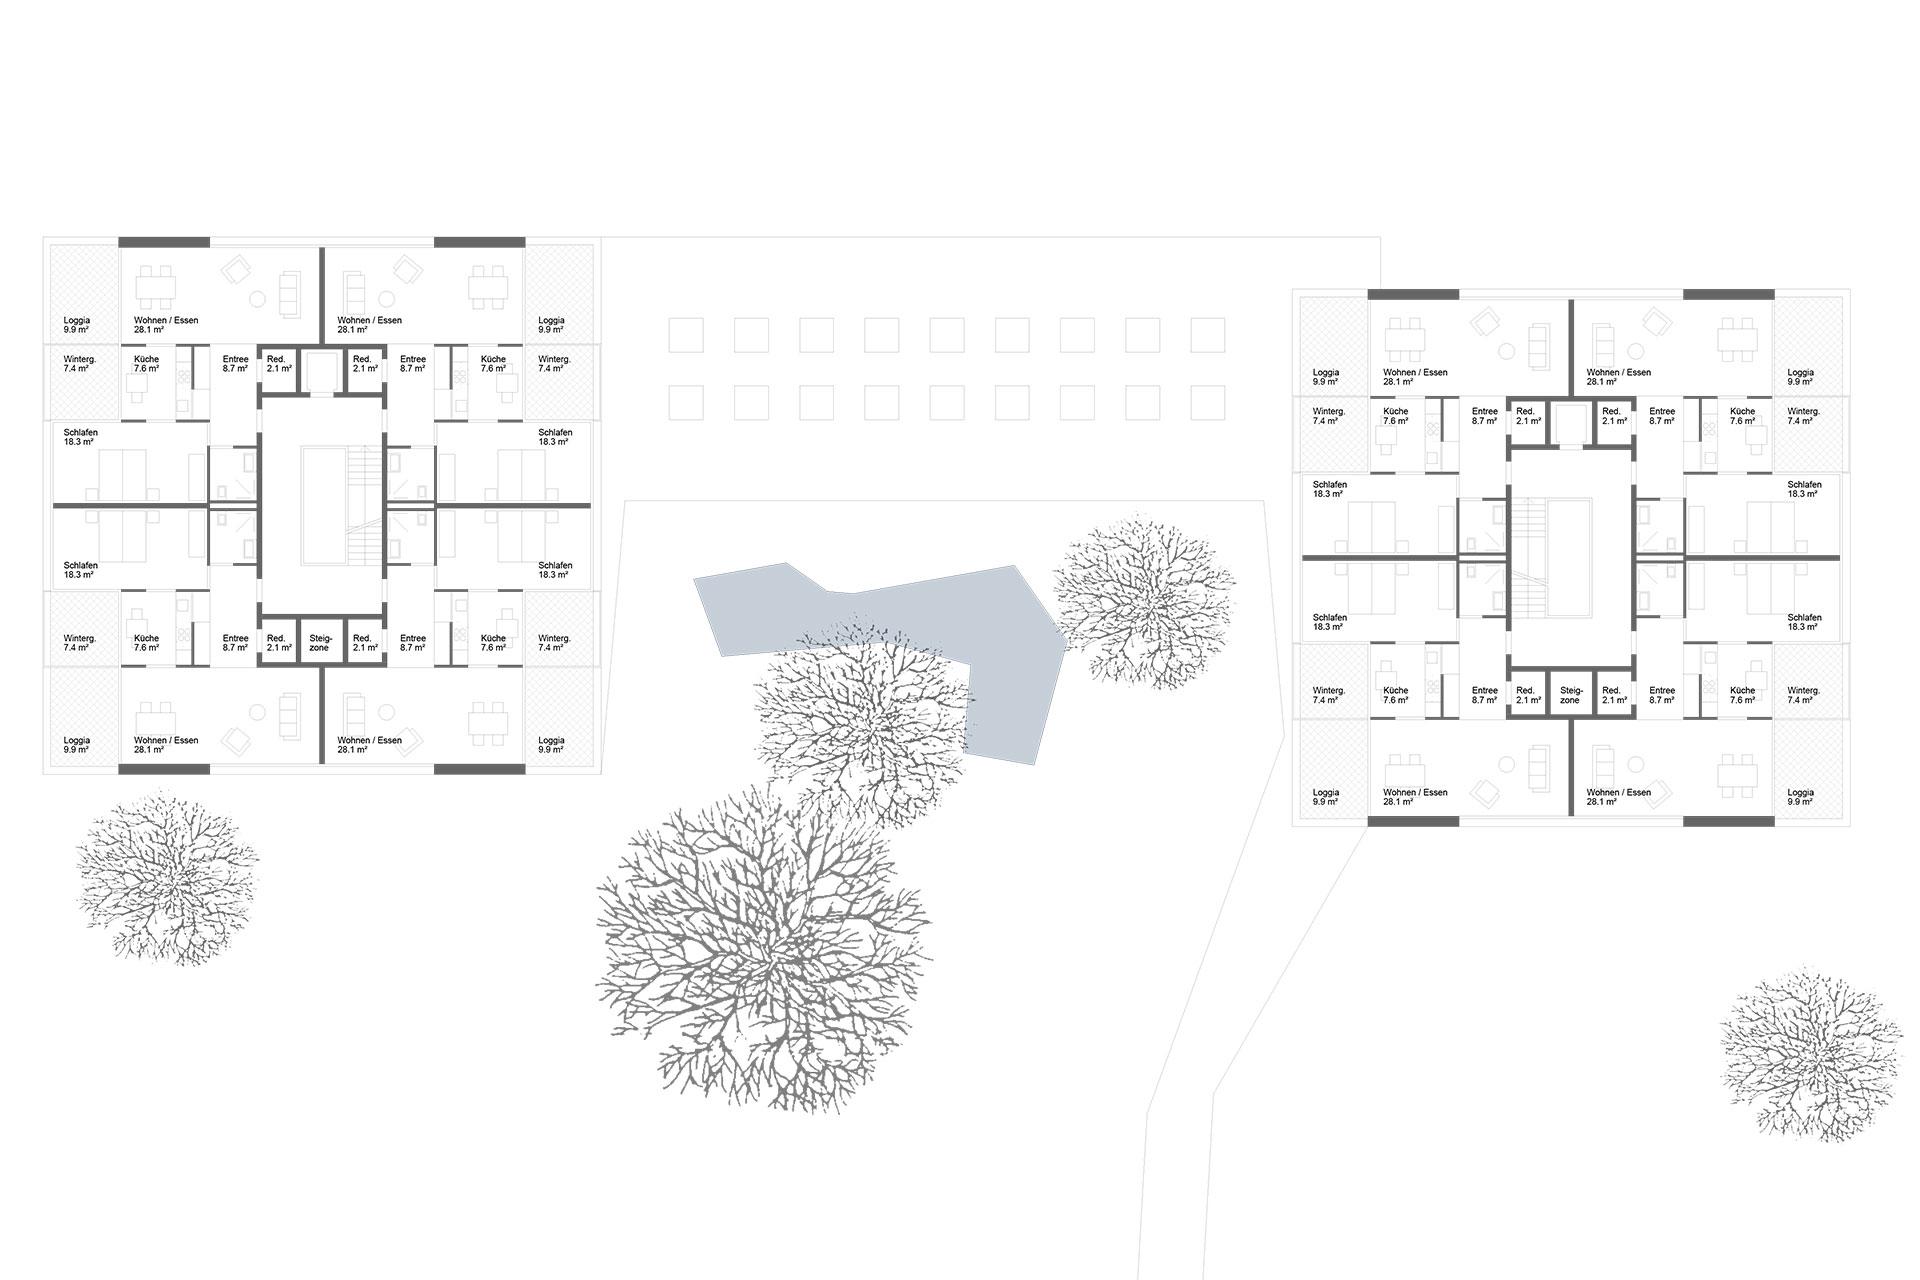 0711-OLTR-Wettbewerb-Grundriss-OG_200